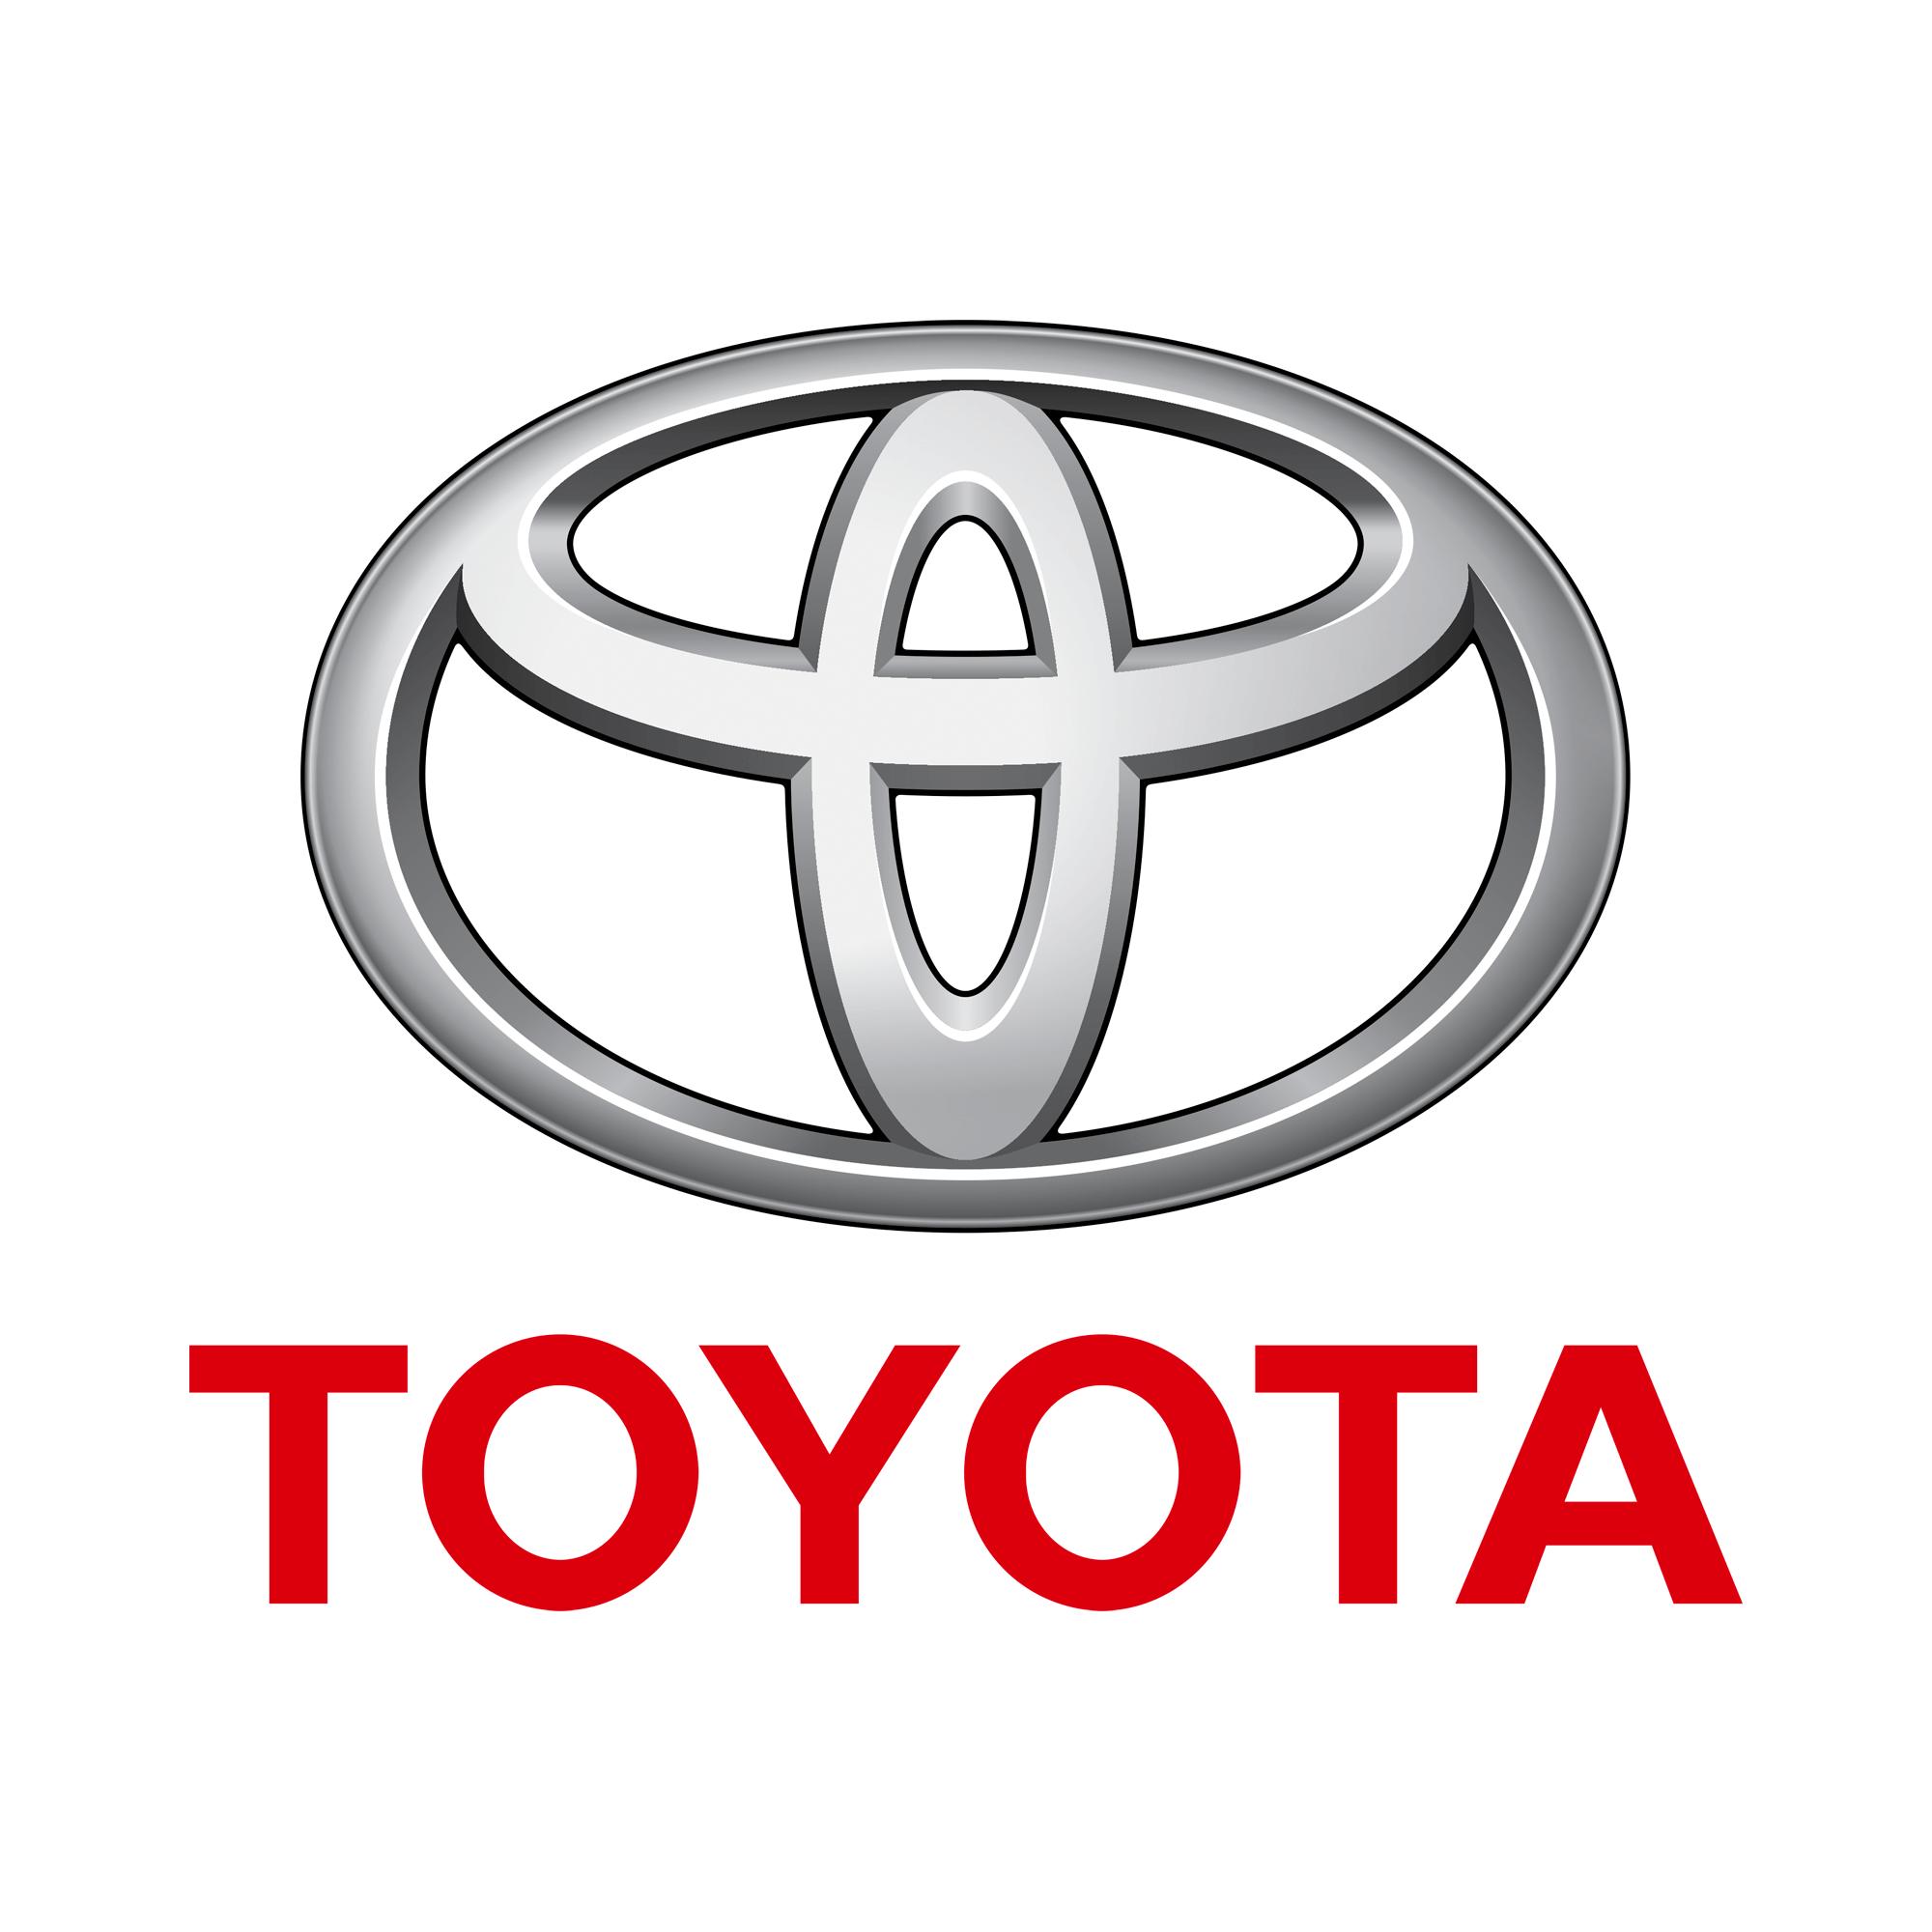 32 Toyota